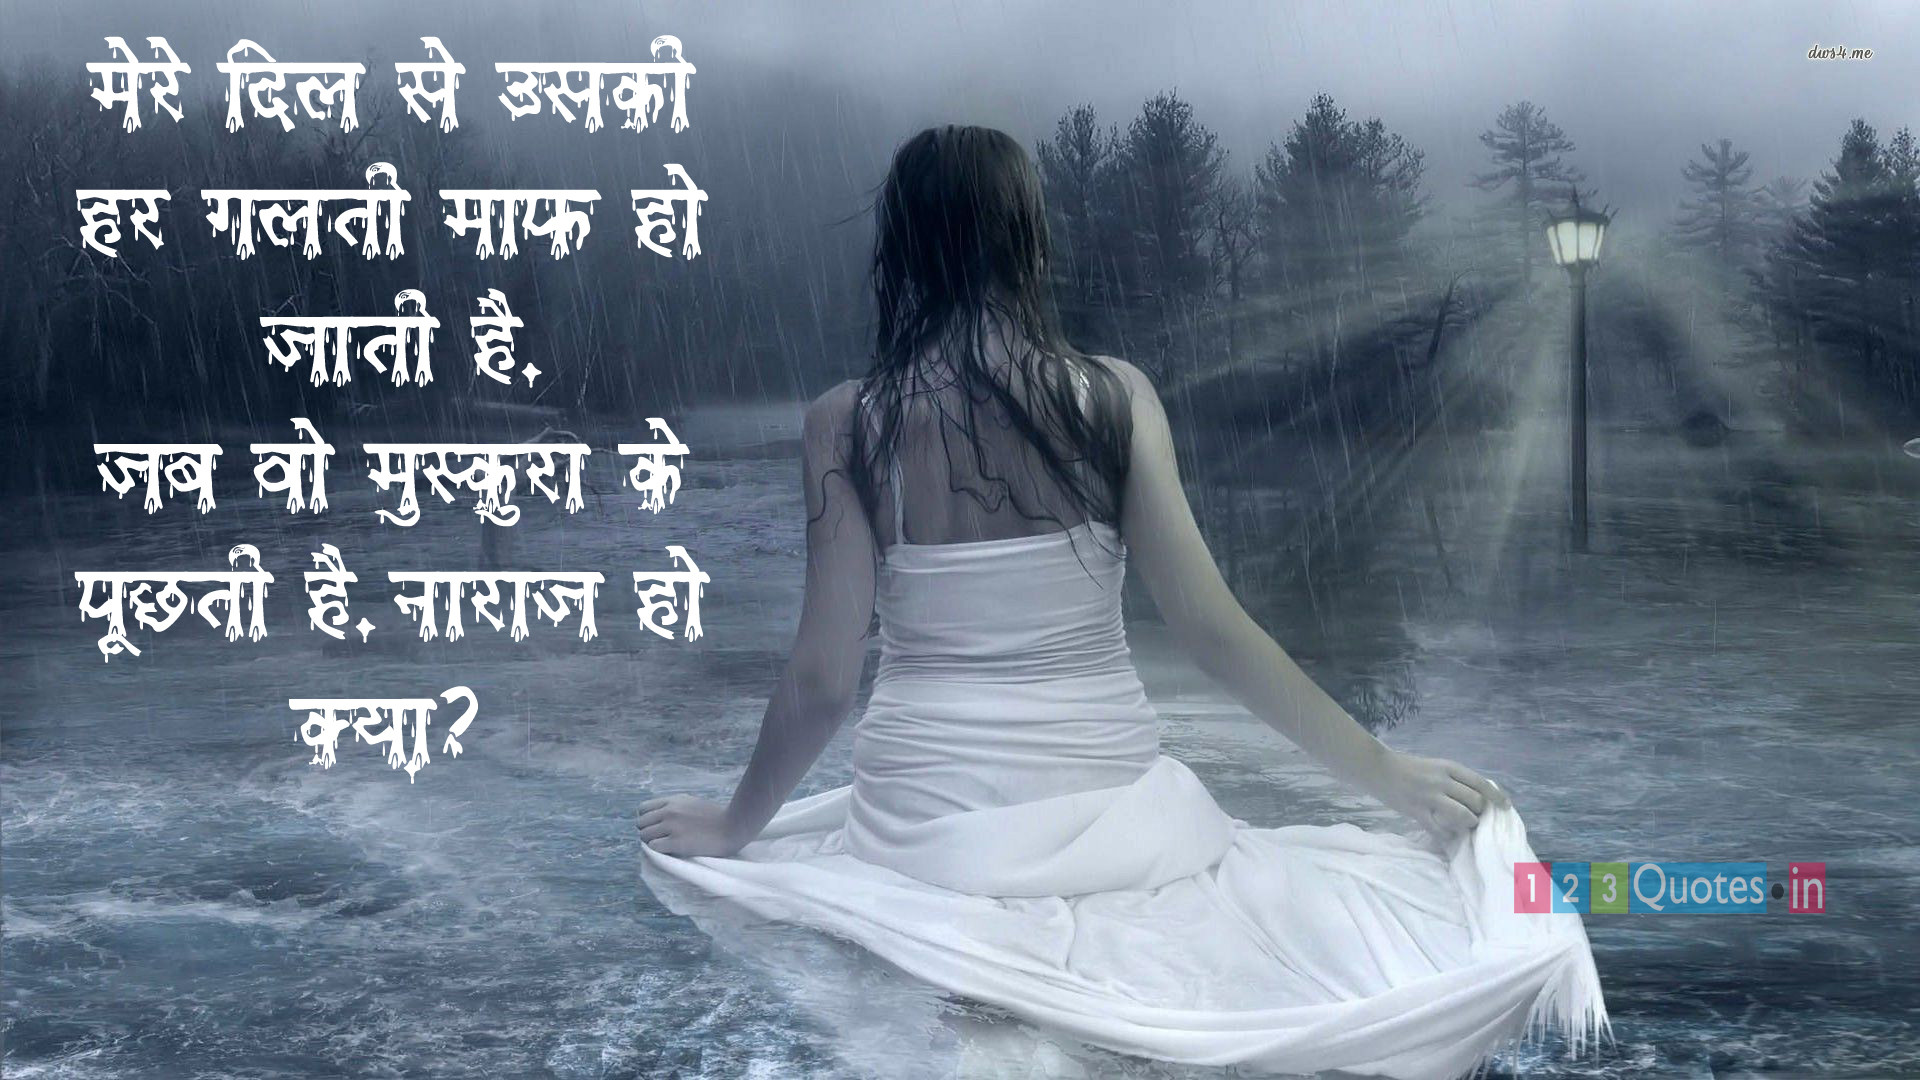 very-sad-barsaat-shayari-wallpapers-hindi-poetry-rain-